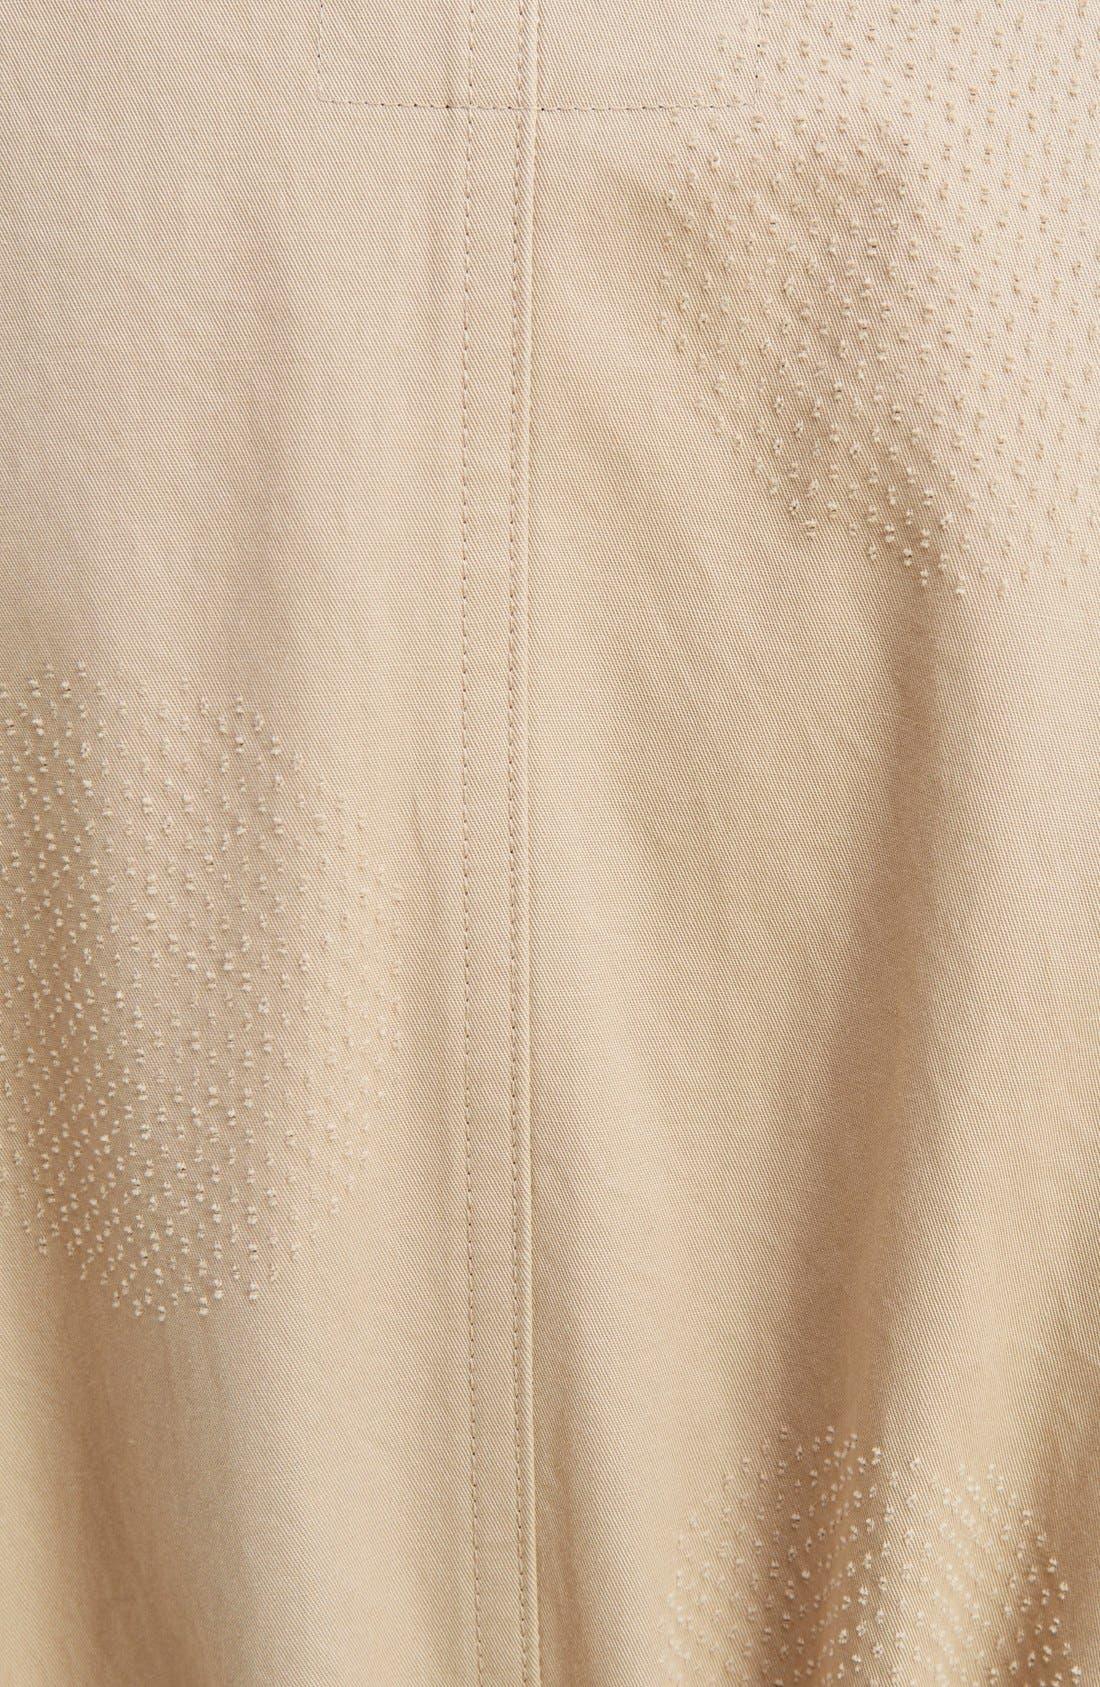 U-Gown Coat,                             Alternate thumbnail 3, color,                             250